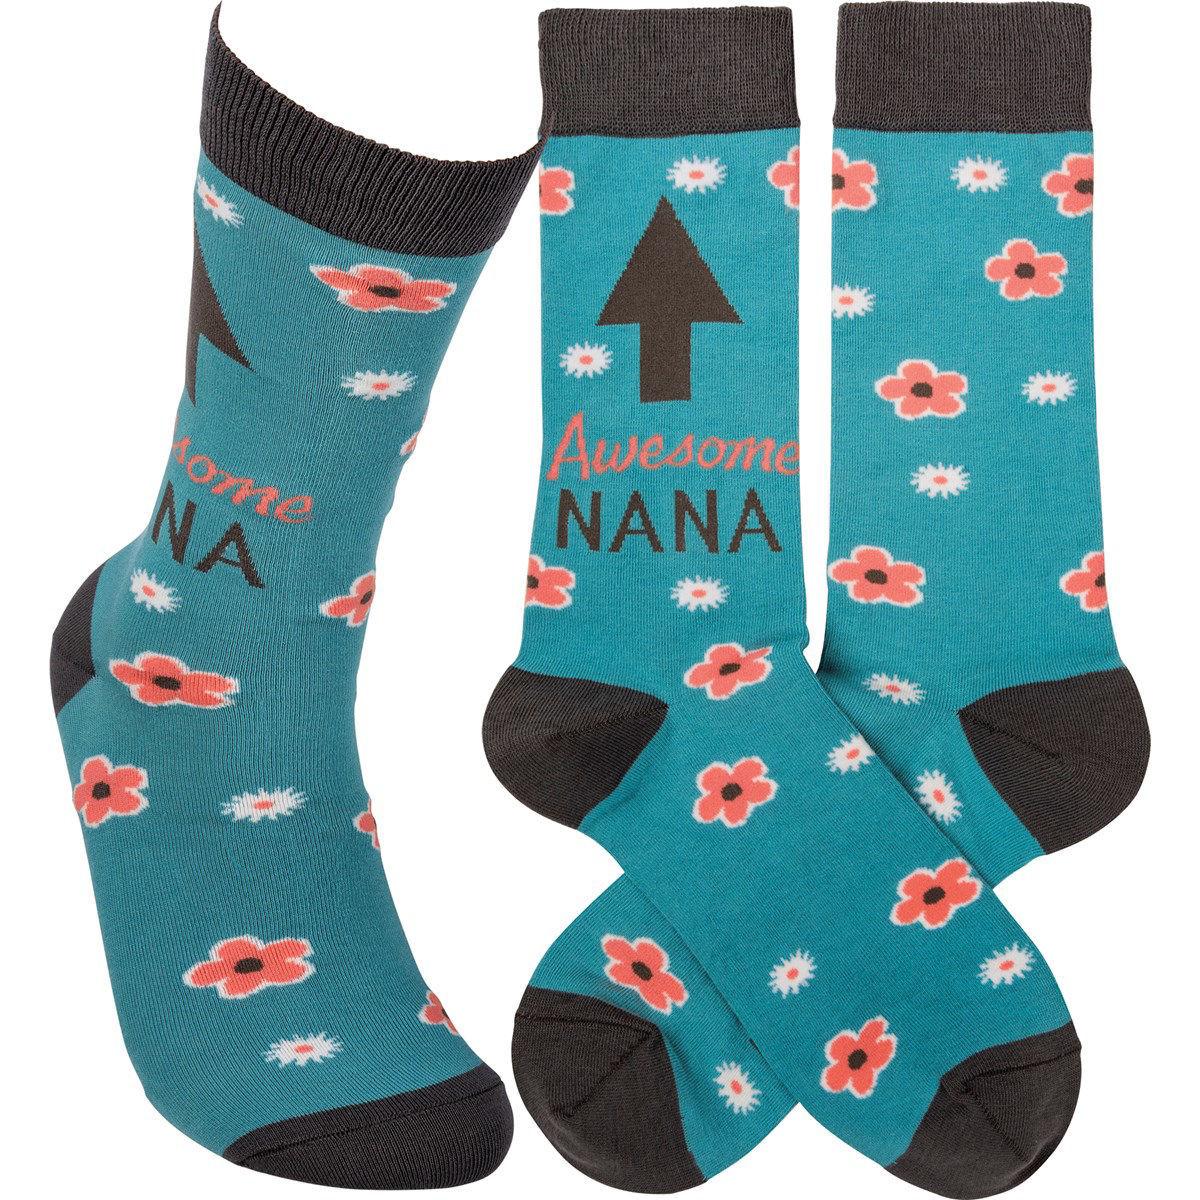 Awesome Nana Socks by Primitives by Kathy